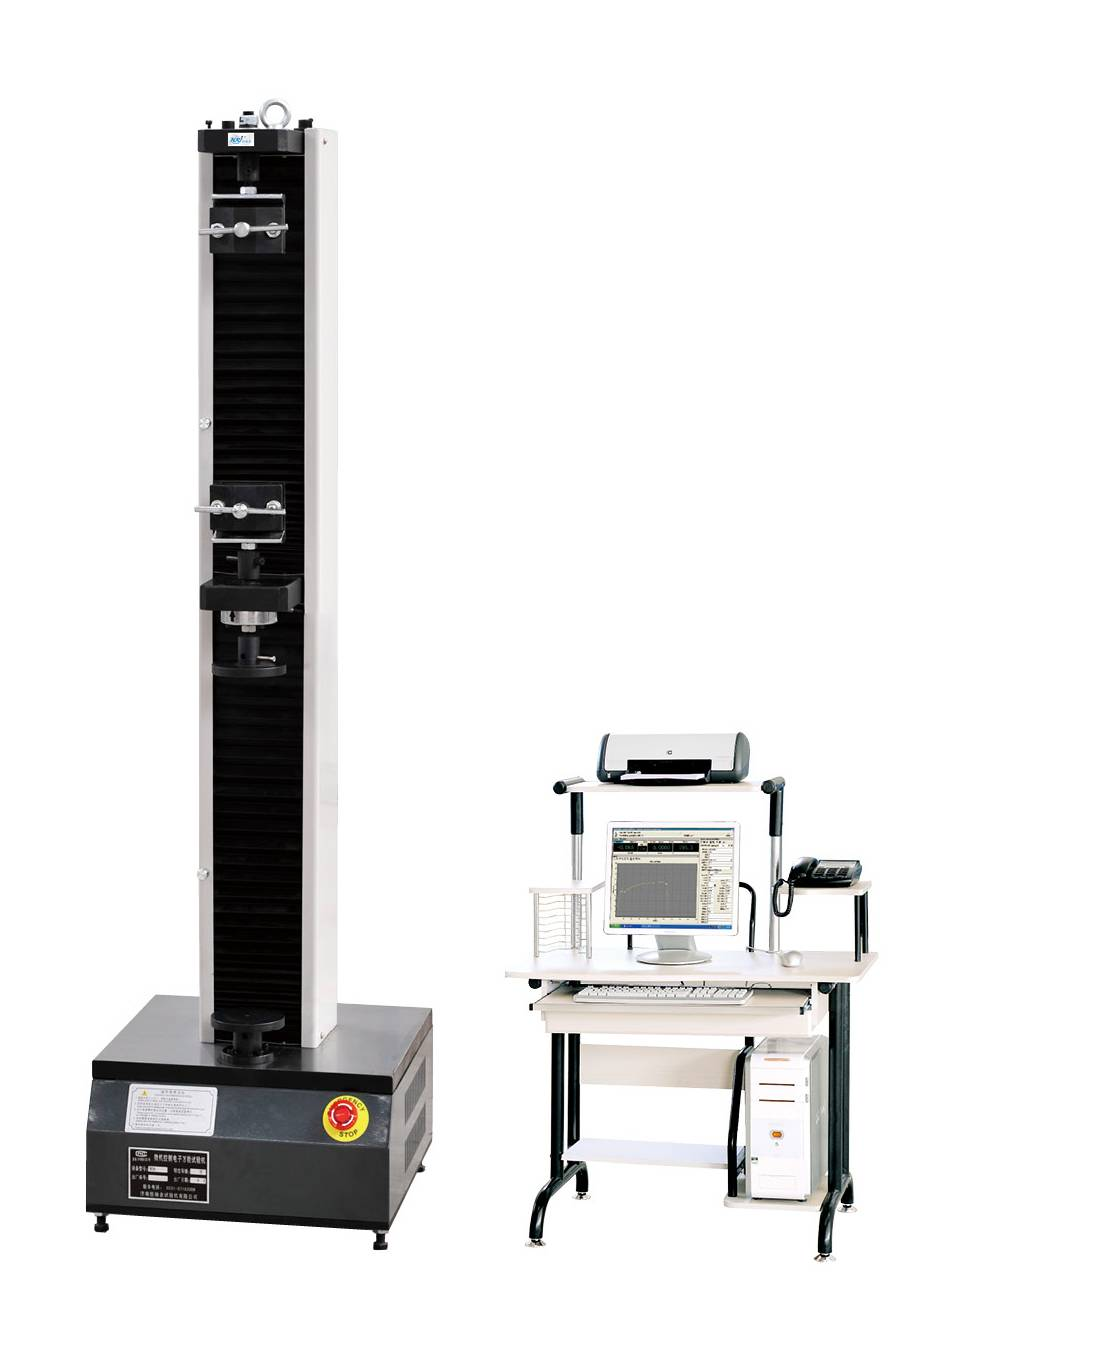 polypropylene pearl films tensile testing machine